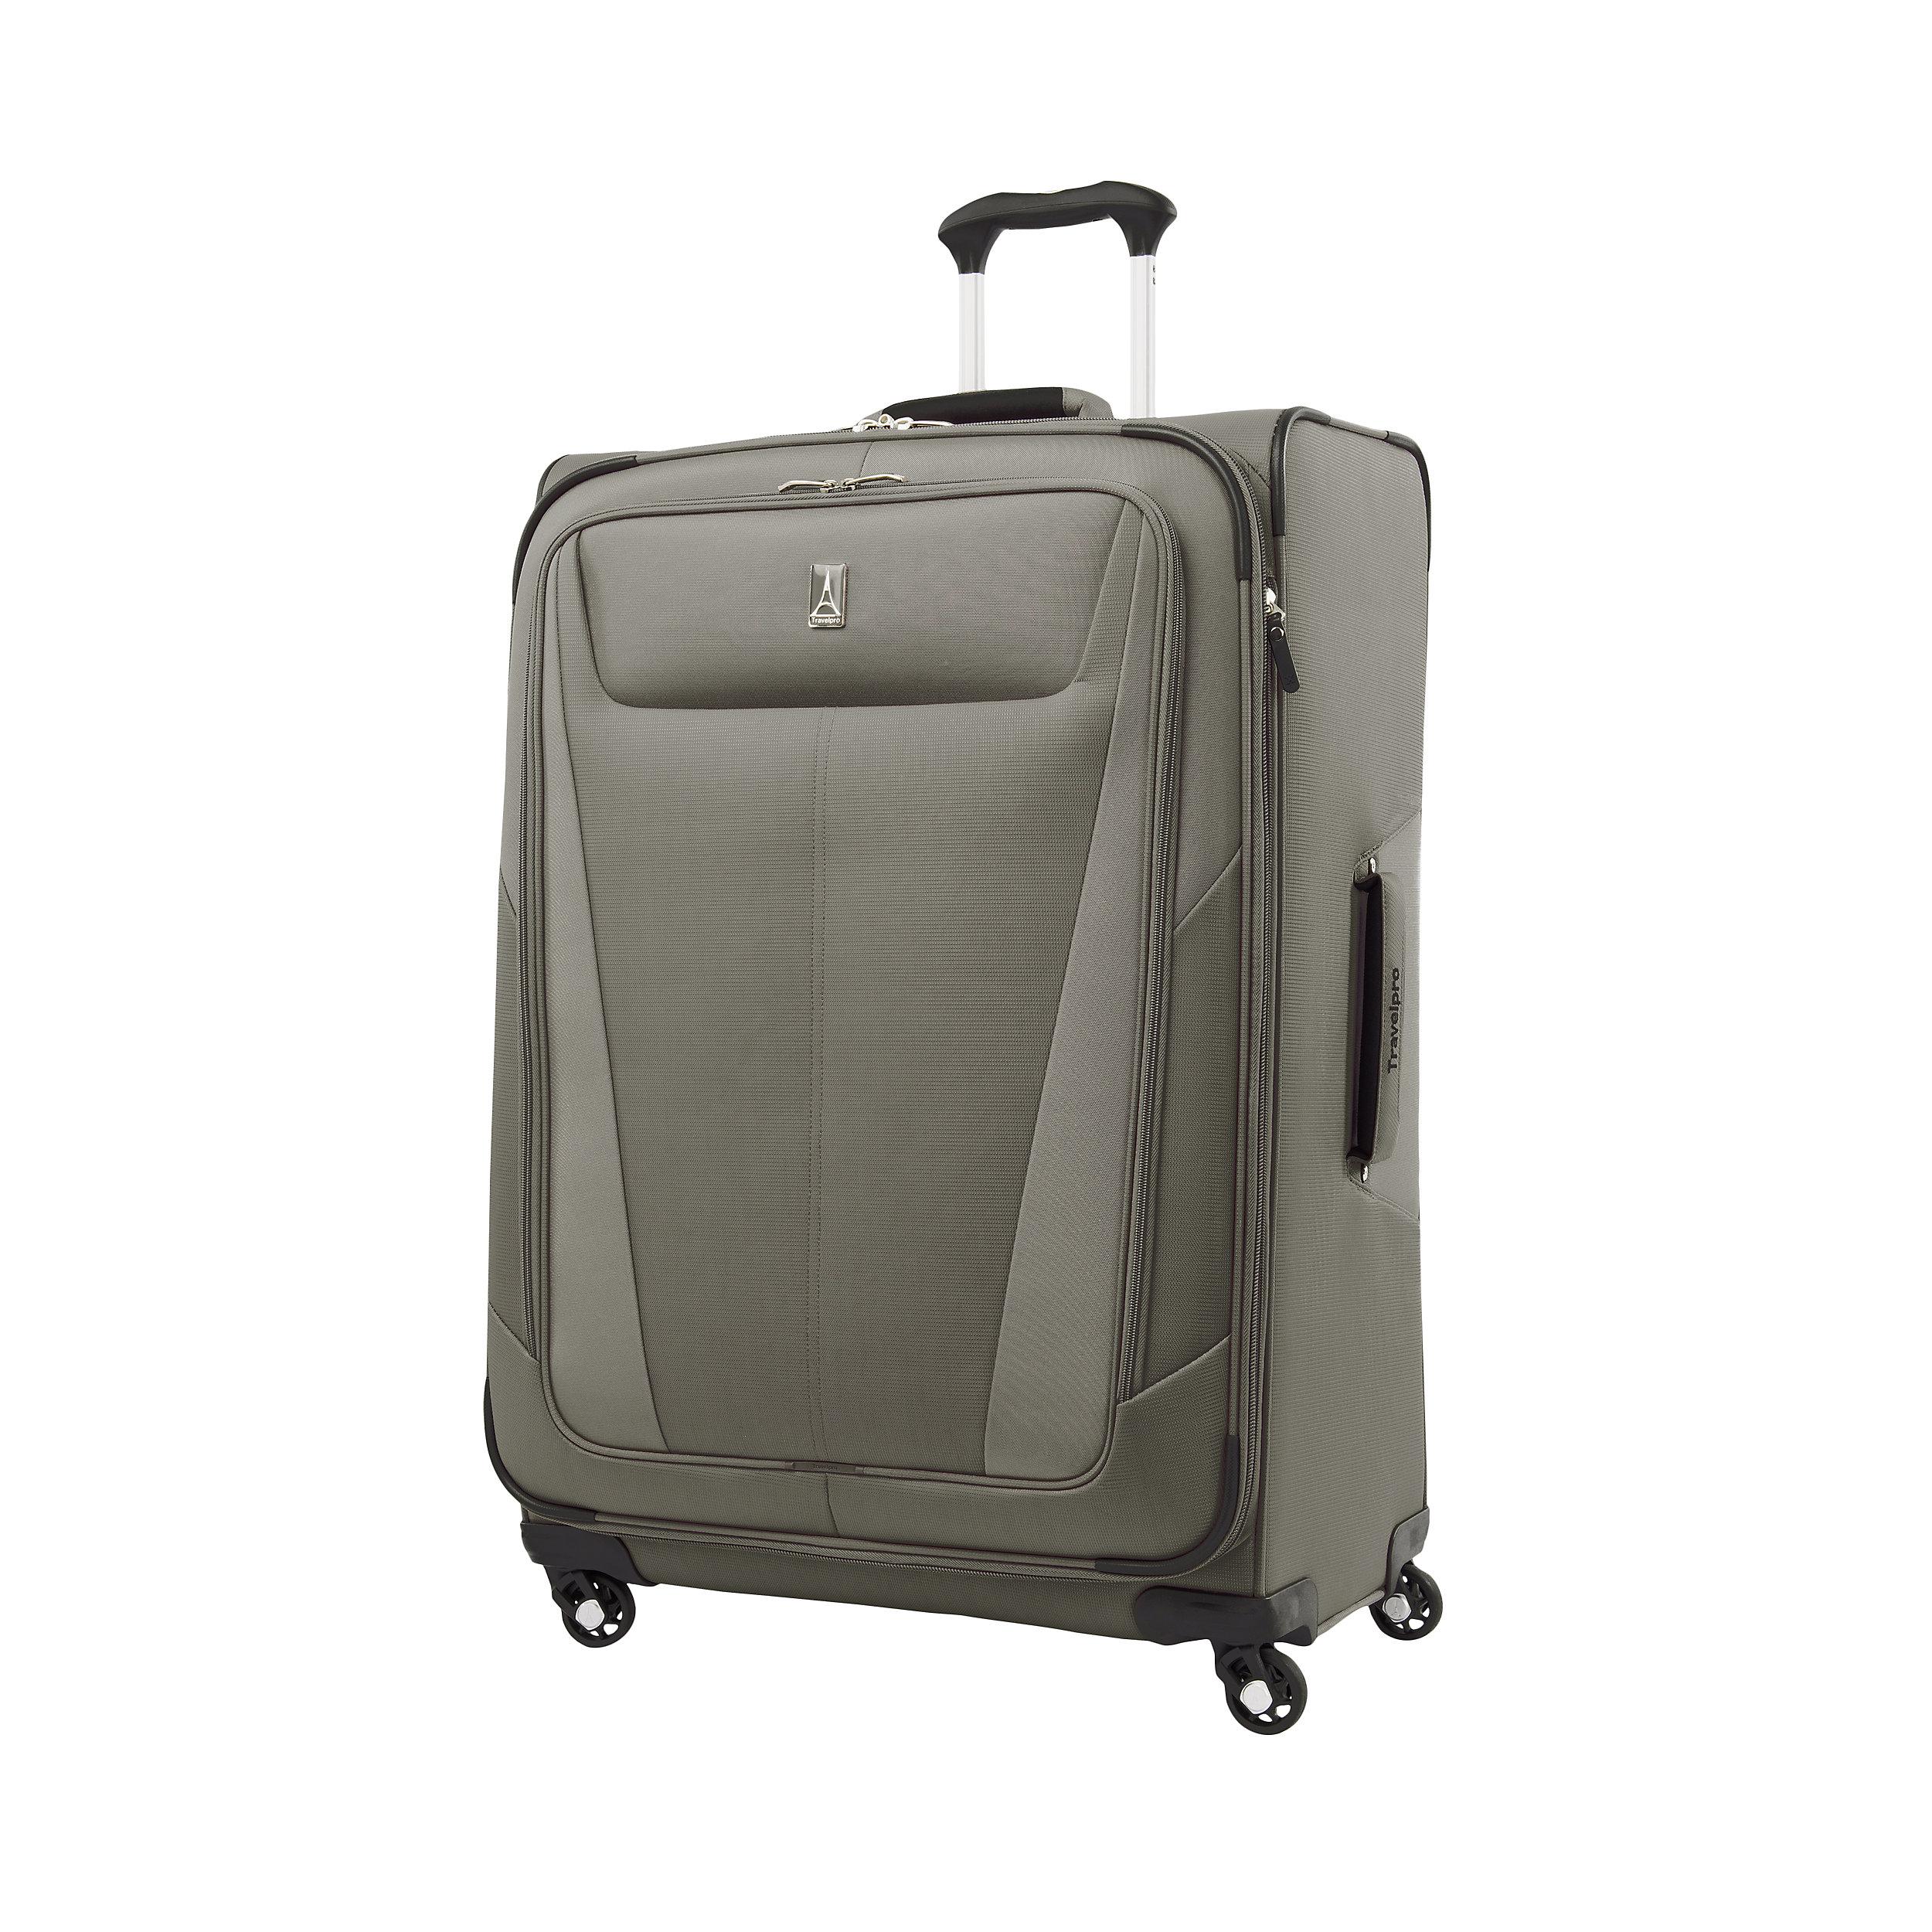 Suitcase with 4 wheels 79 cm Expandable Maxlite 5 Large 142 Liter